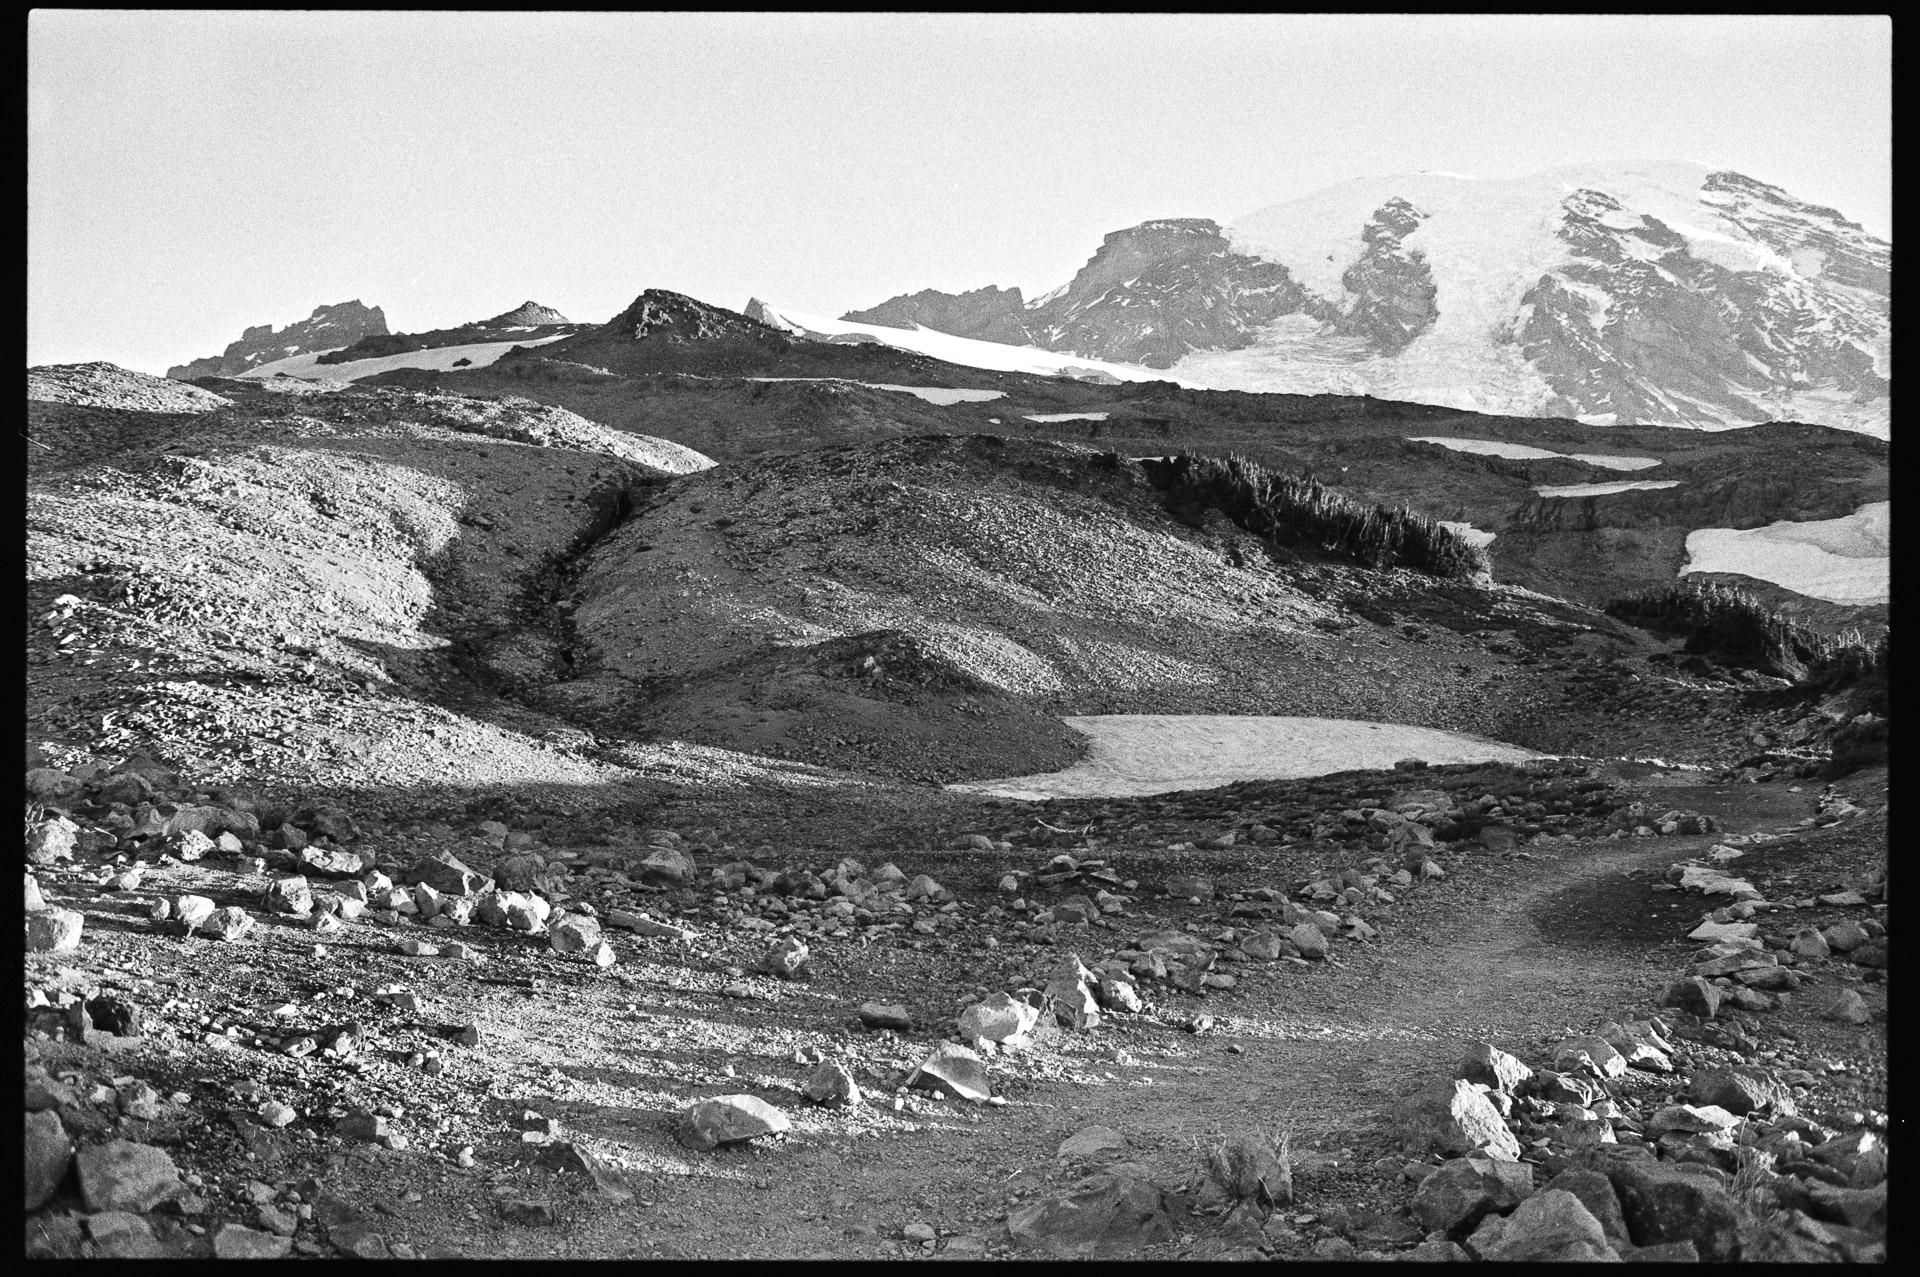 Walk Mt Ranier—Chris-Page-Art-9.jpg